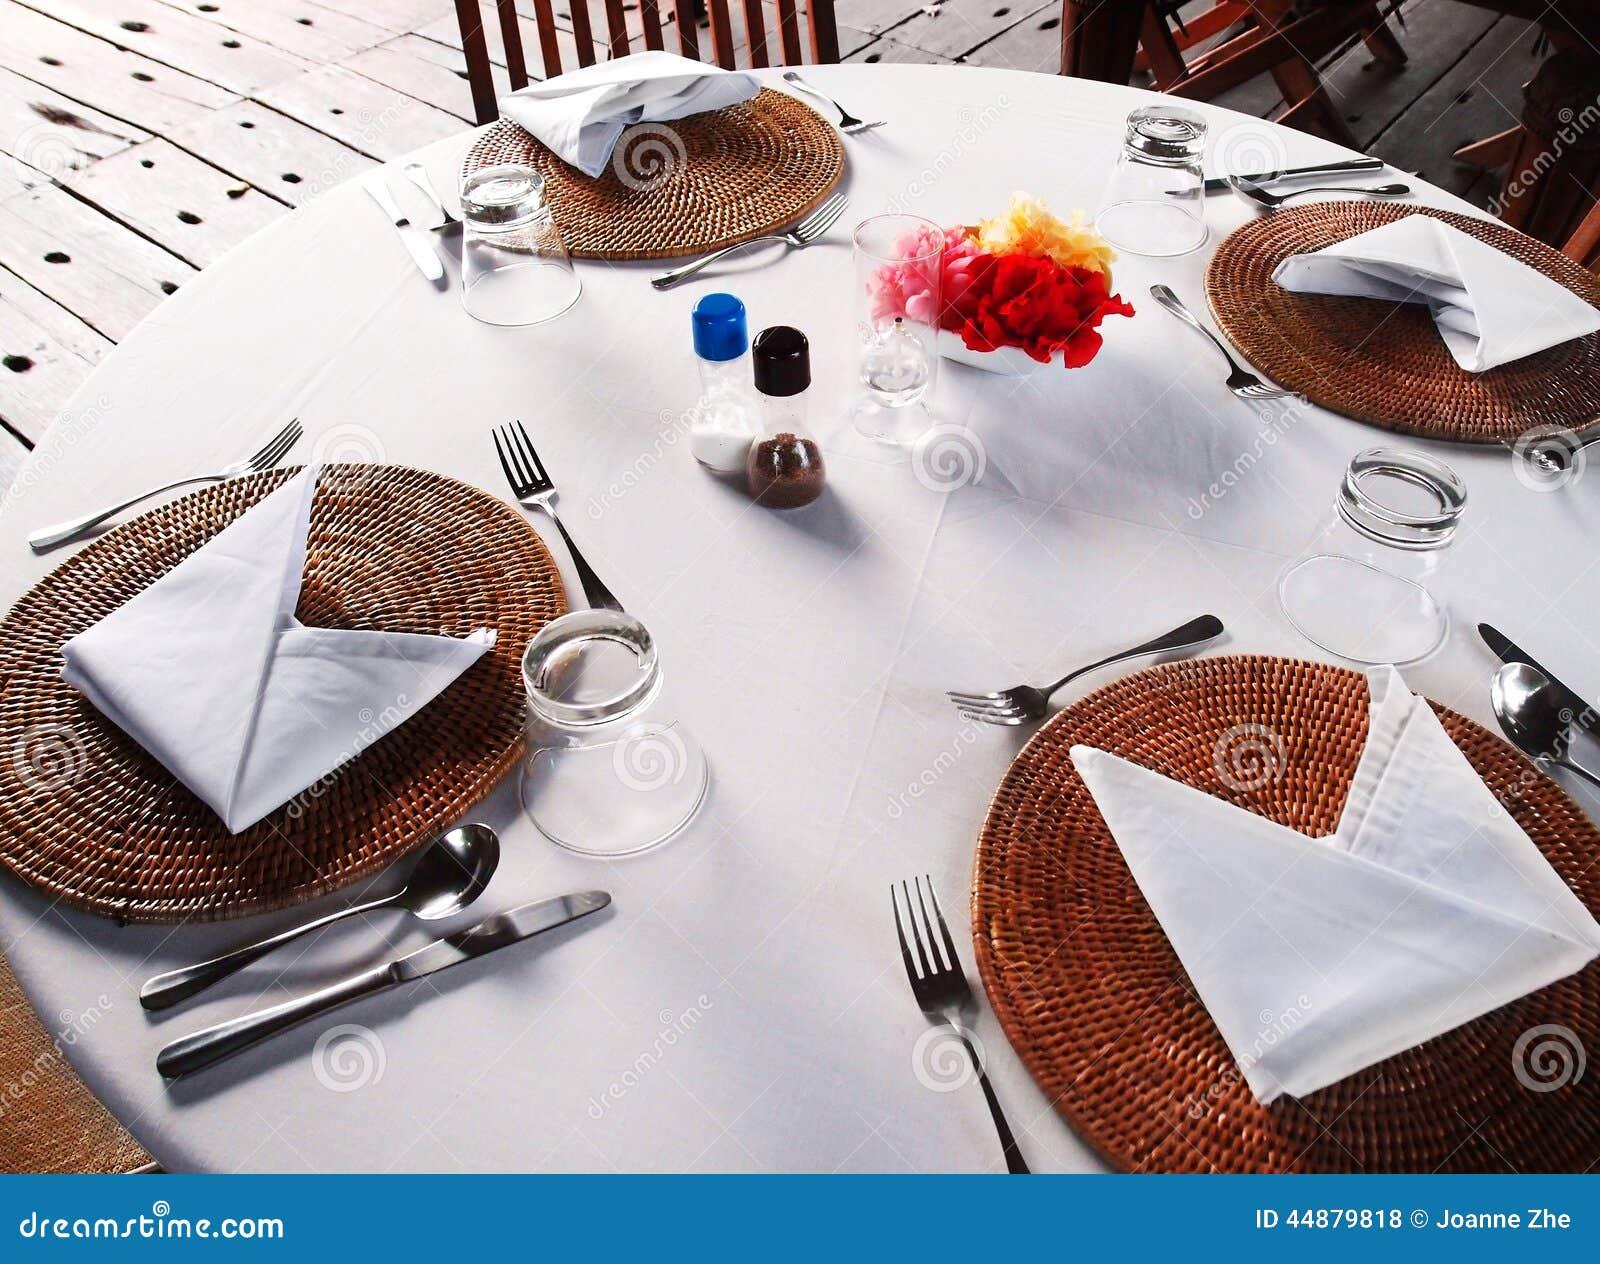 Al Fresco Dining Table Setting Stock Photo Image 44879818 : al fresco dining table setting photograph showing casual stylish cutlery dinner resort hotel restaurant 44879818 from www.dreamstime.com size 1300 x 1044 jpeg 224kB